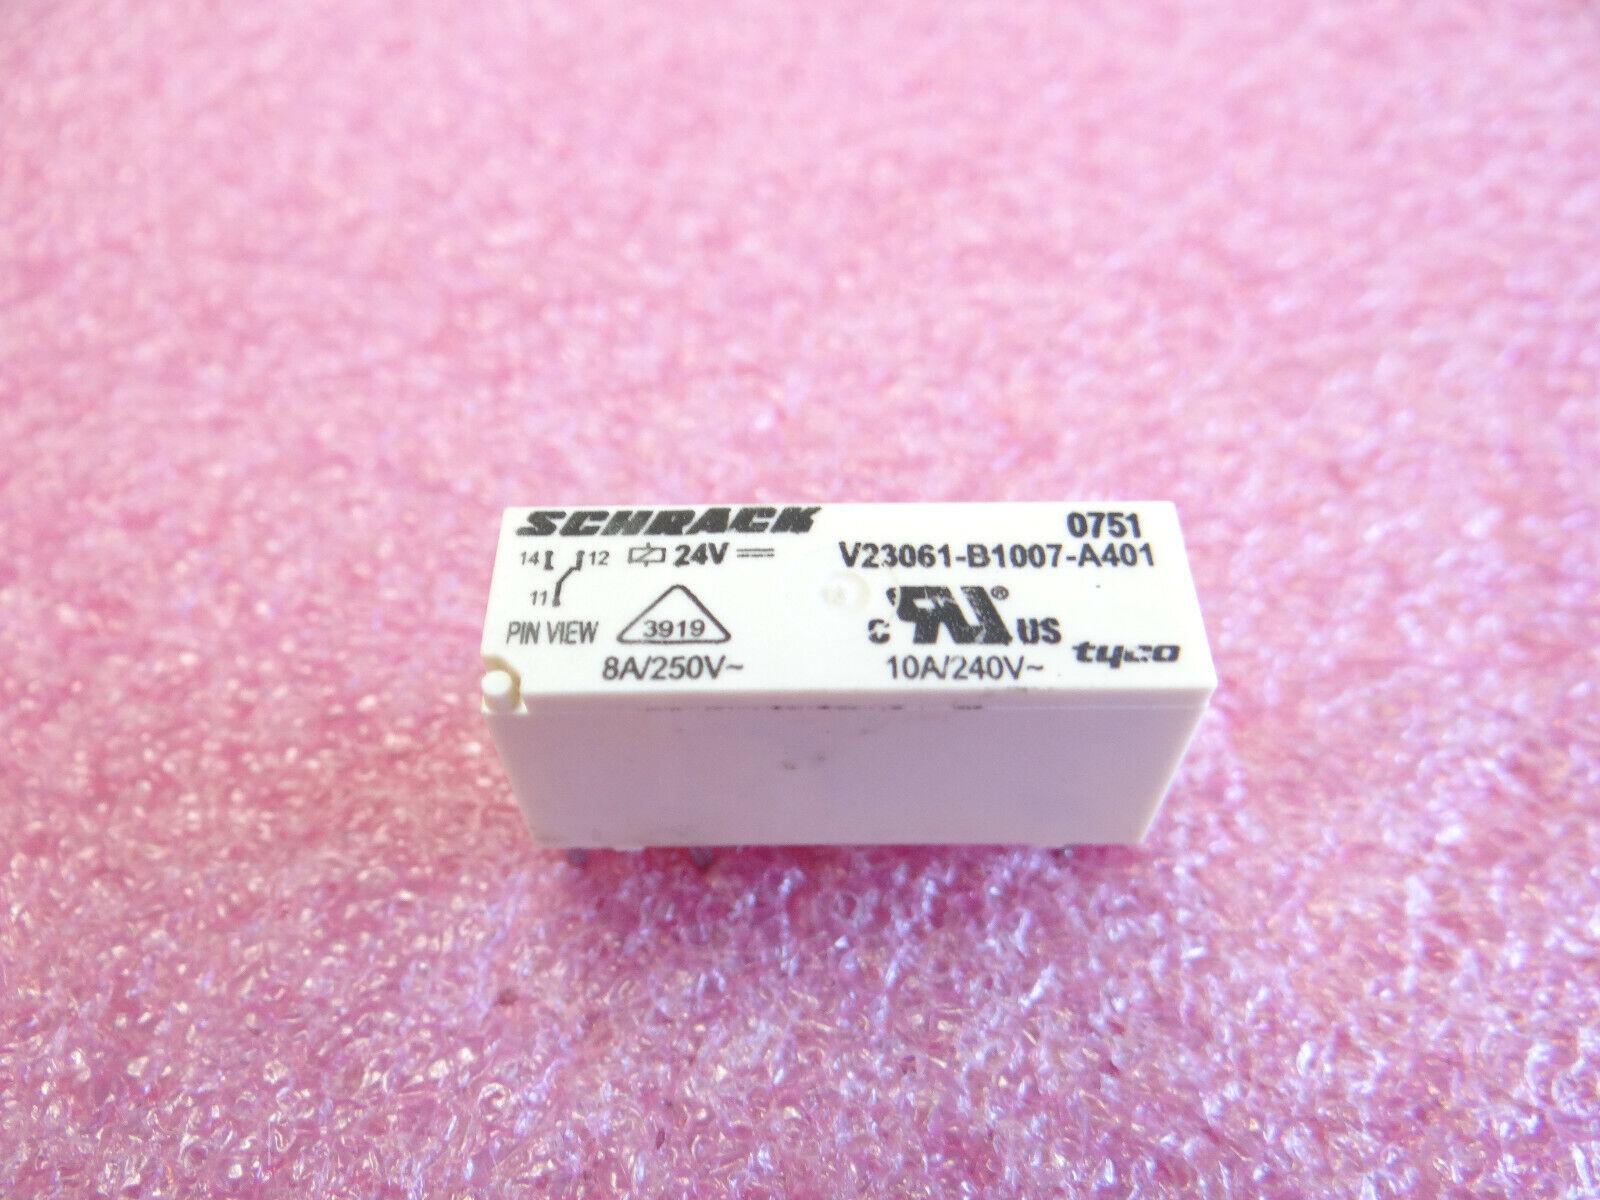 20 x Resistance couche metal 15,8K 15K8 15.8Kohm 15,8K ohm 1//2W 1/%           RCM